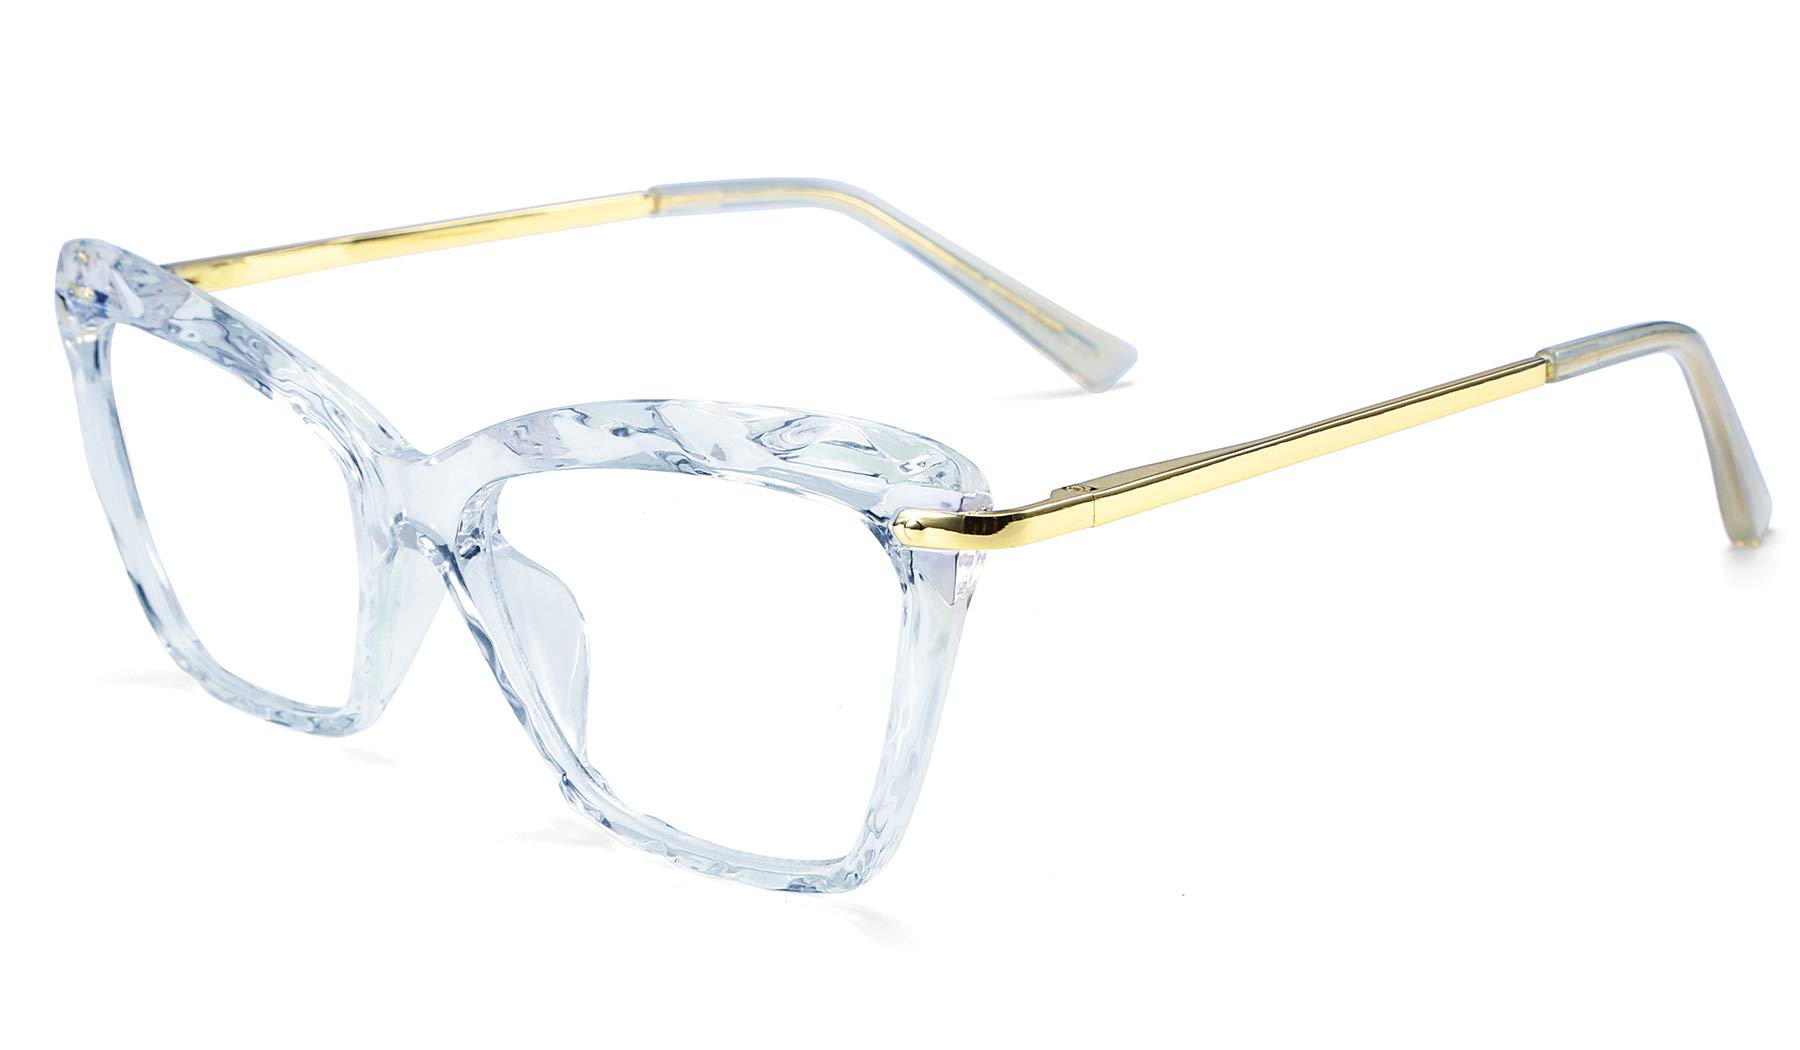 42b98e2feb FEISEDY Cat Eye Glasses Frame Crystal Non Prescription Eyewear Women B2440  product image